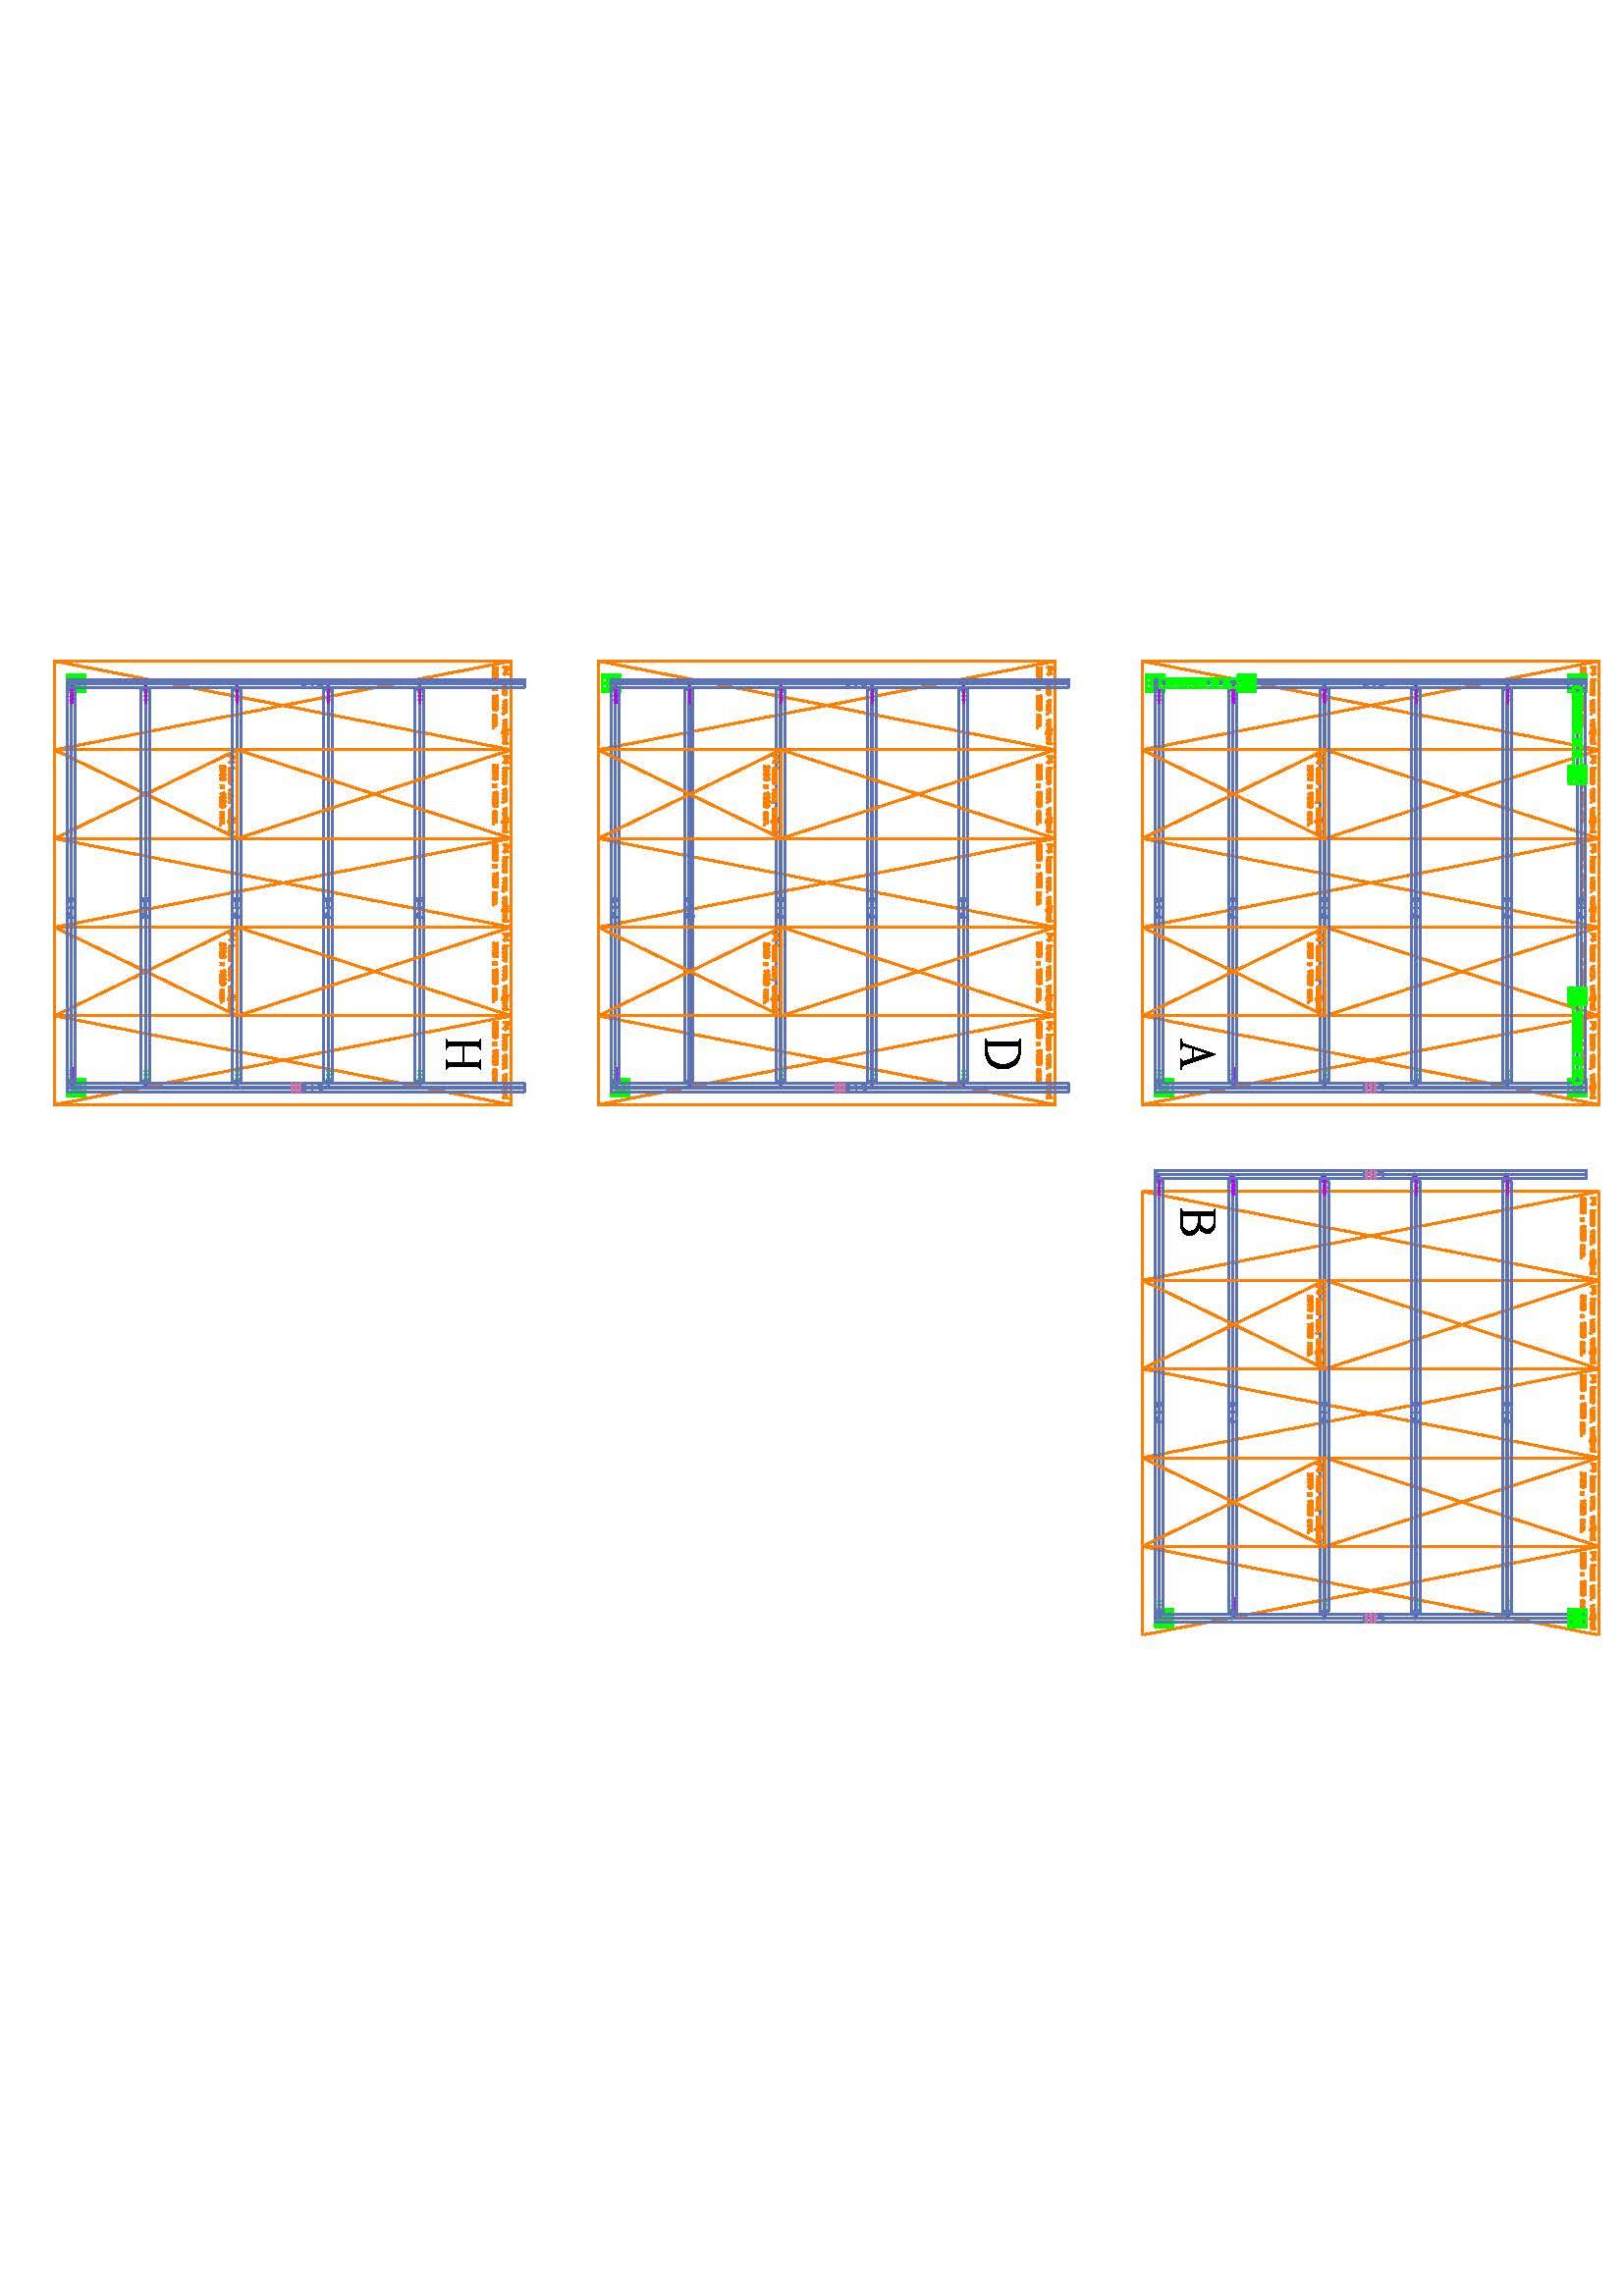 etagevloer-module-magazijnvloer-tussenverdieping-magazijnruimte-11